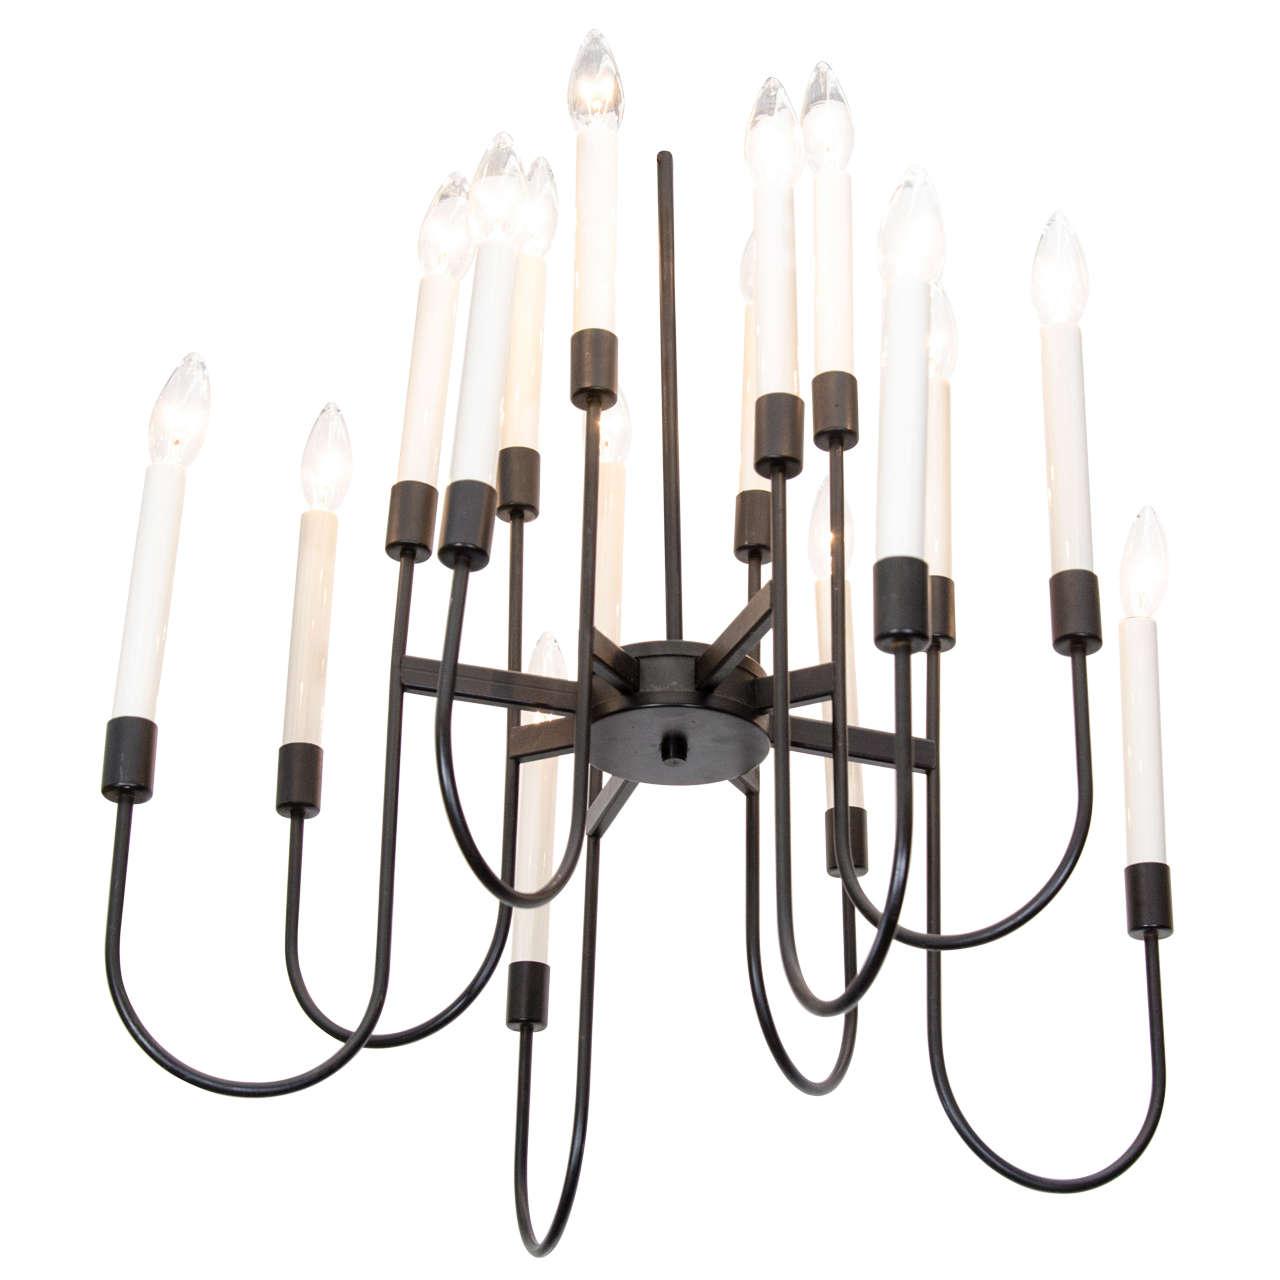 Mid century 16 light lightolier chandelier at 1stdibs mid century 16 light lightolier chandelier for sale aloadofball Images